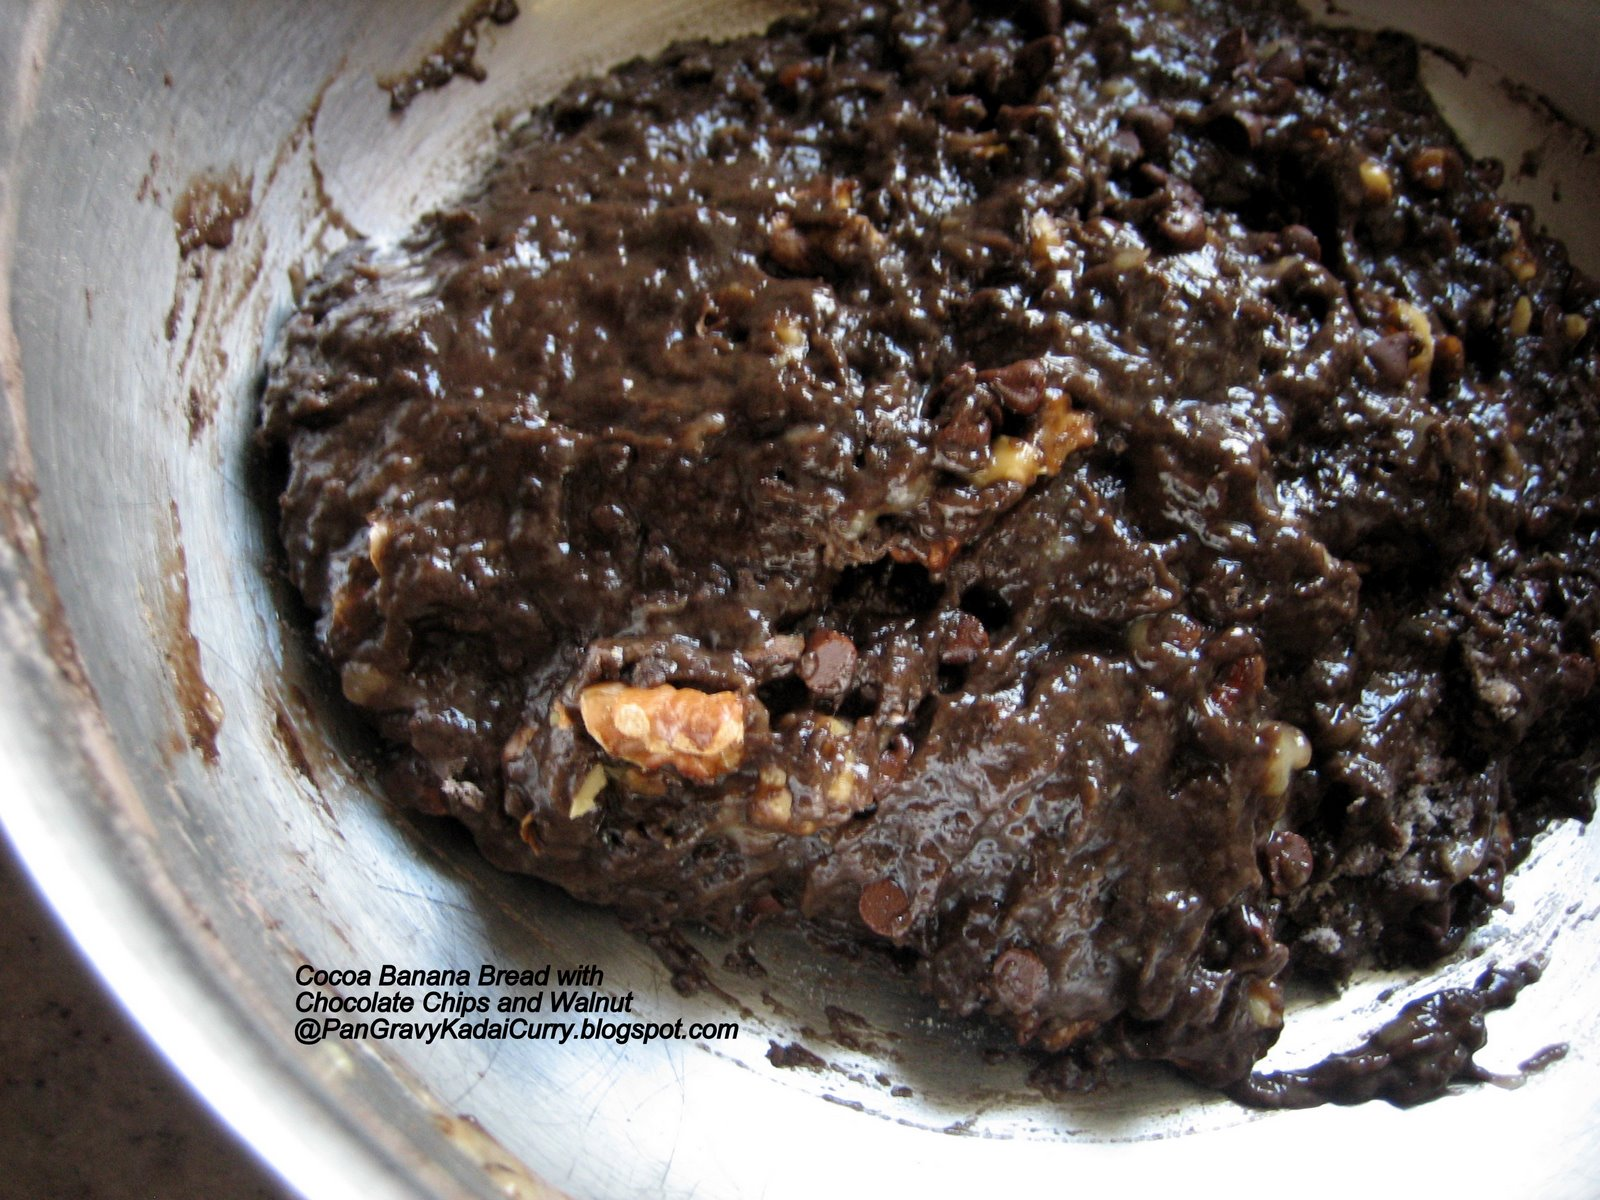 ... Gravy Kadai Curry: Cocoa Banana Bread With Chocolate Chips and Walnuts